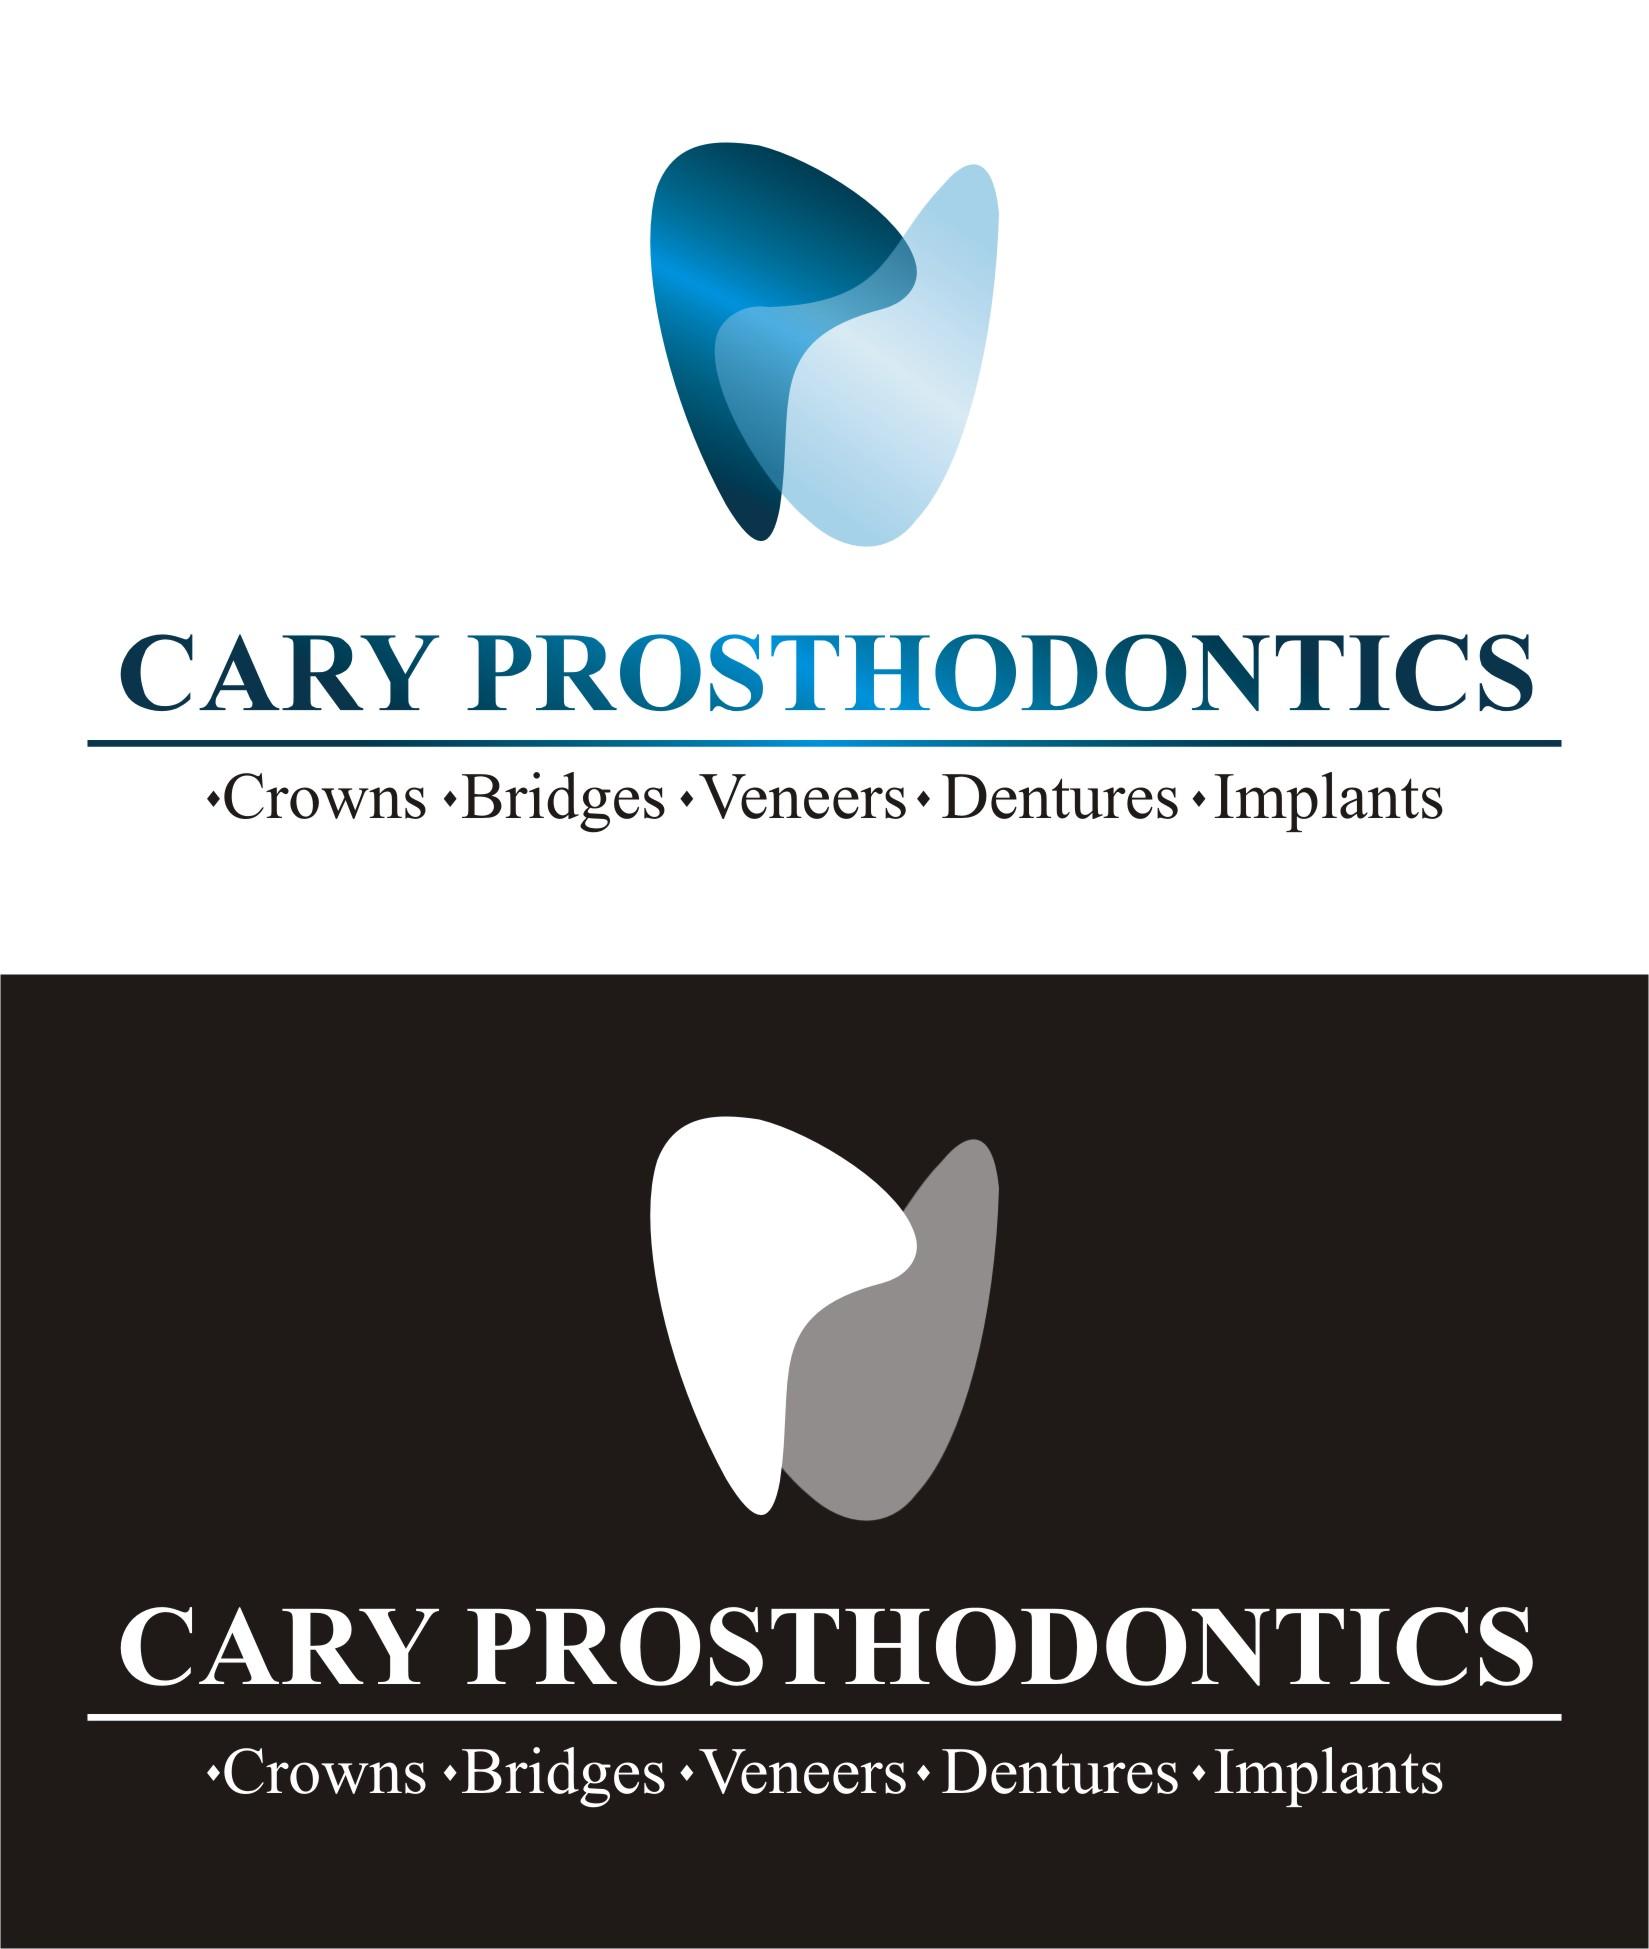 Logo Design by I graphics GRAPHICS - Entry No. 64 in the Logo Design Contest Cary Prosthodontics Logo Design.